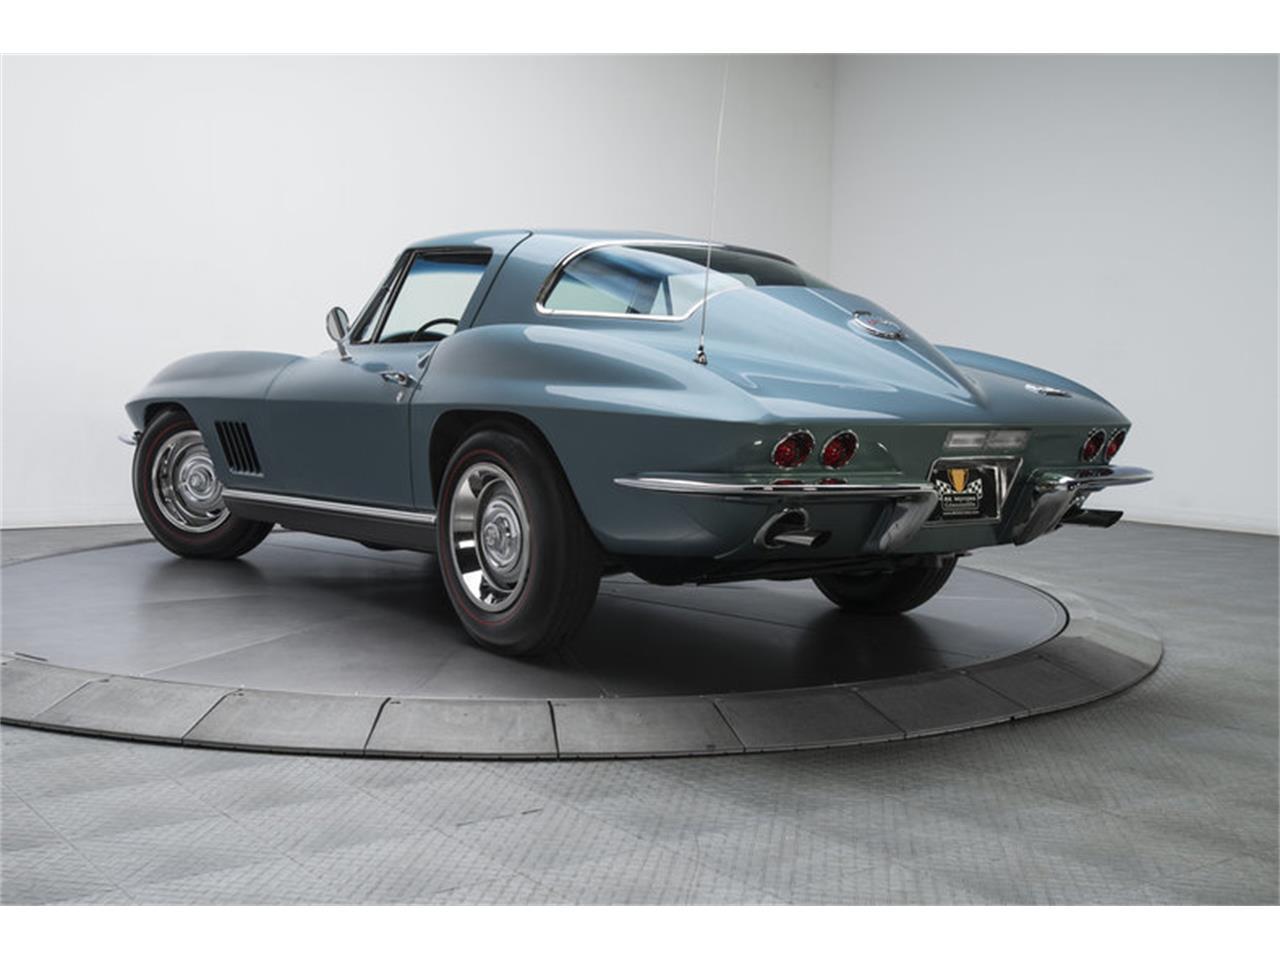 Large Picture of Classic '67 Corvette located in Charlotte North Carolina - $129,900.00 - MESF